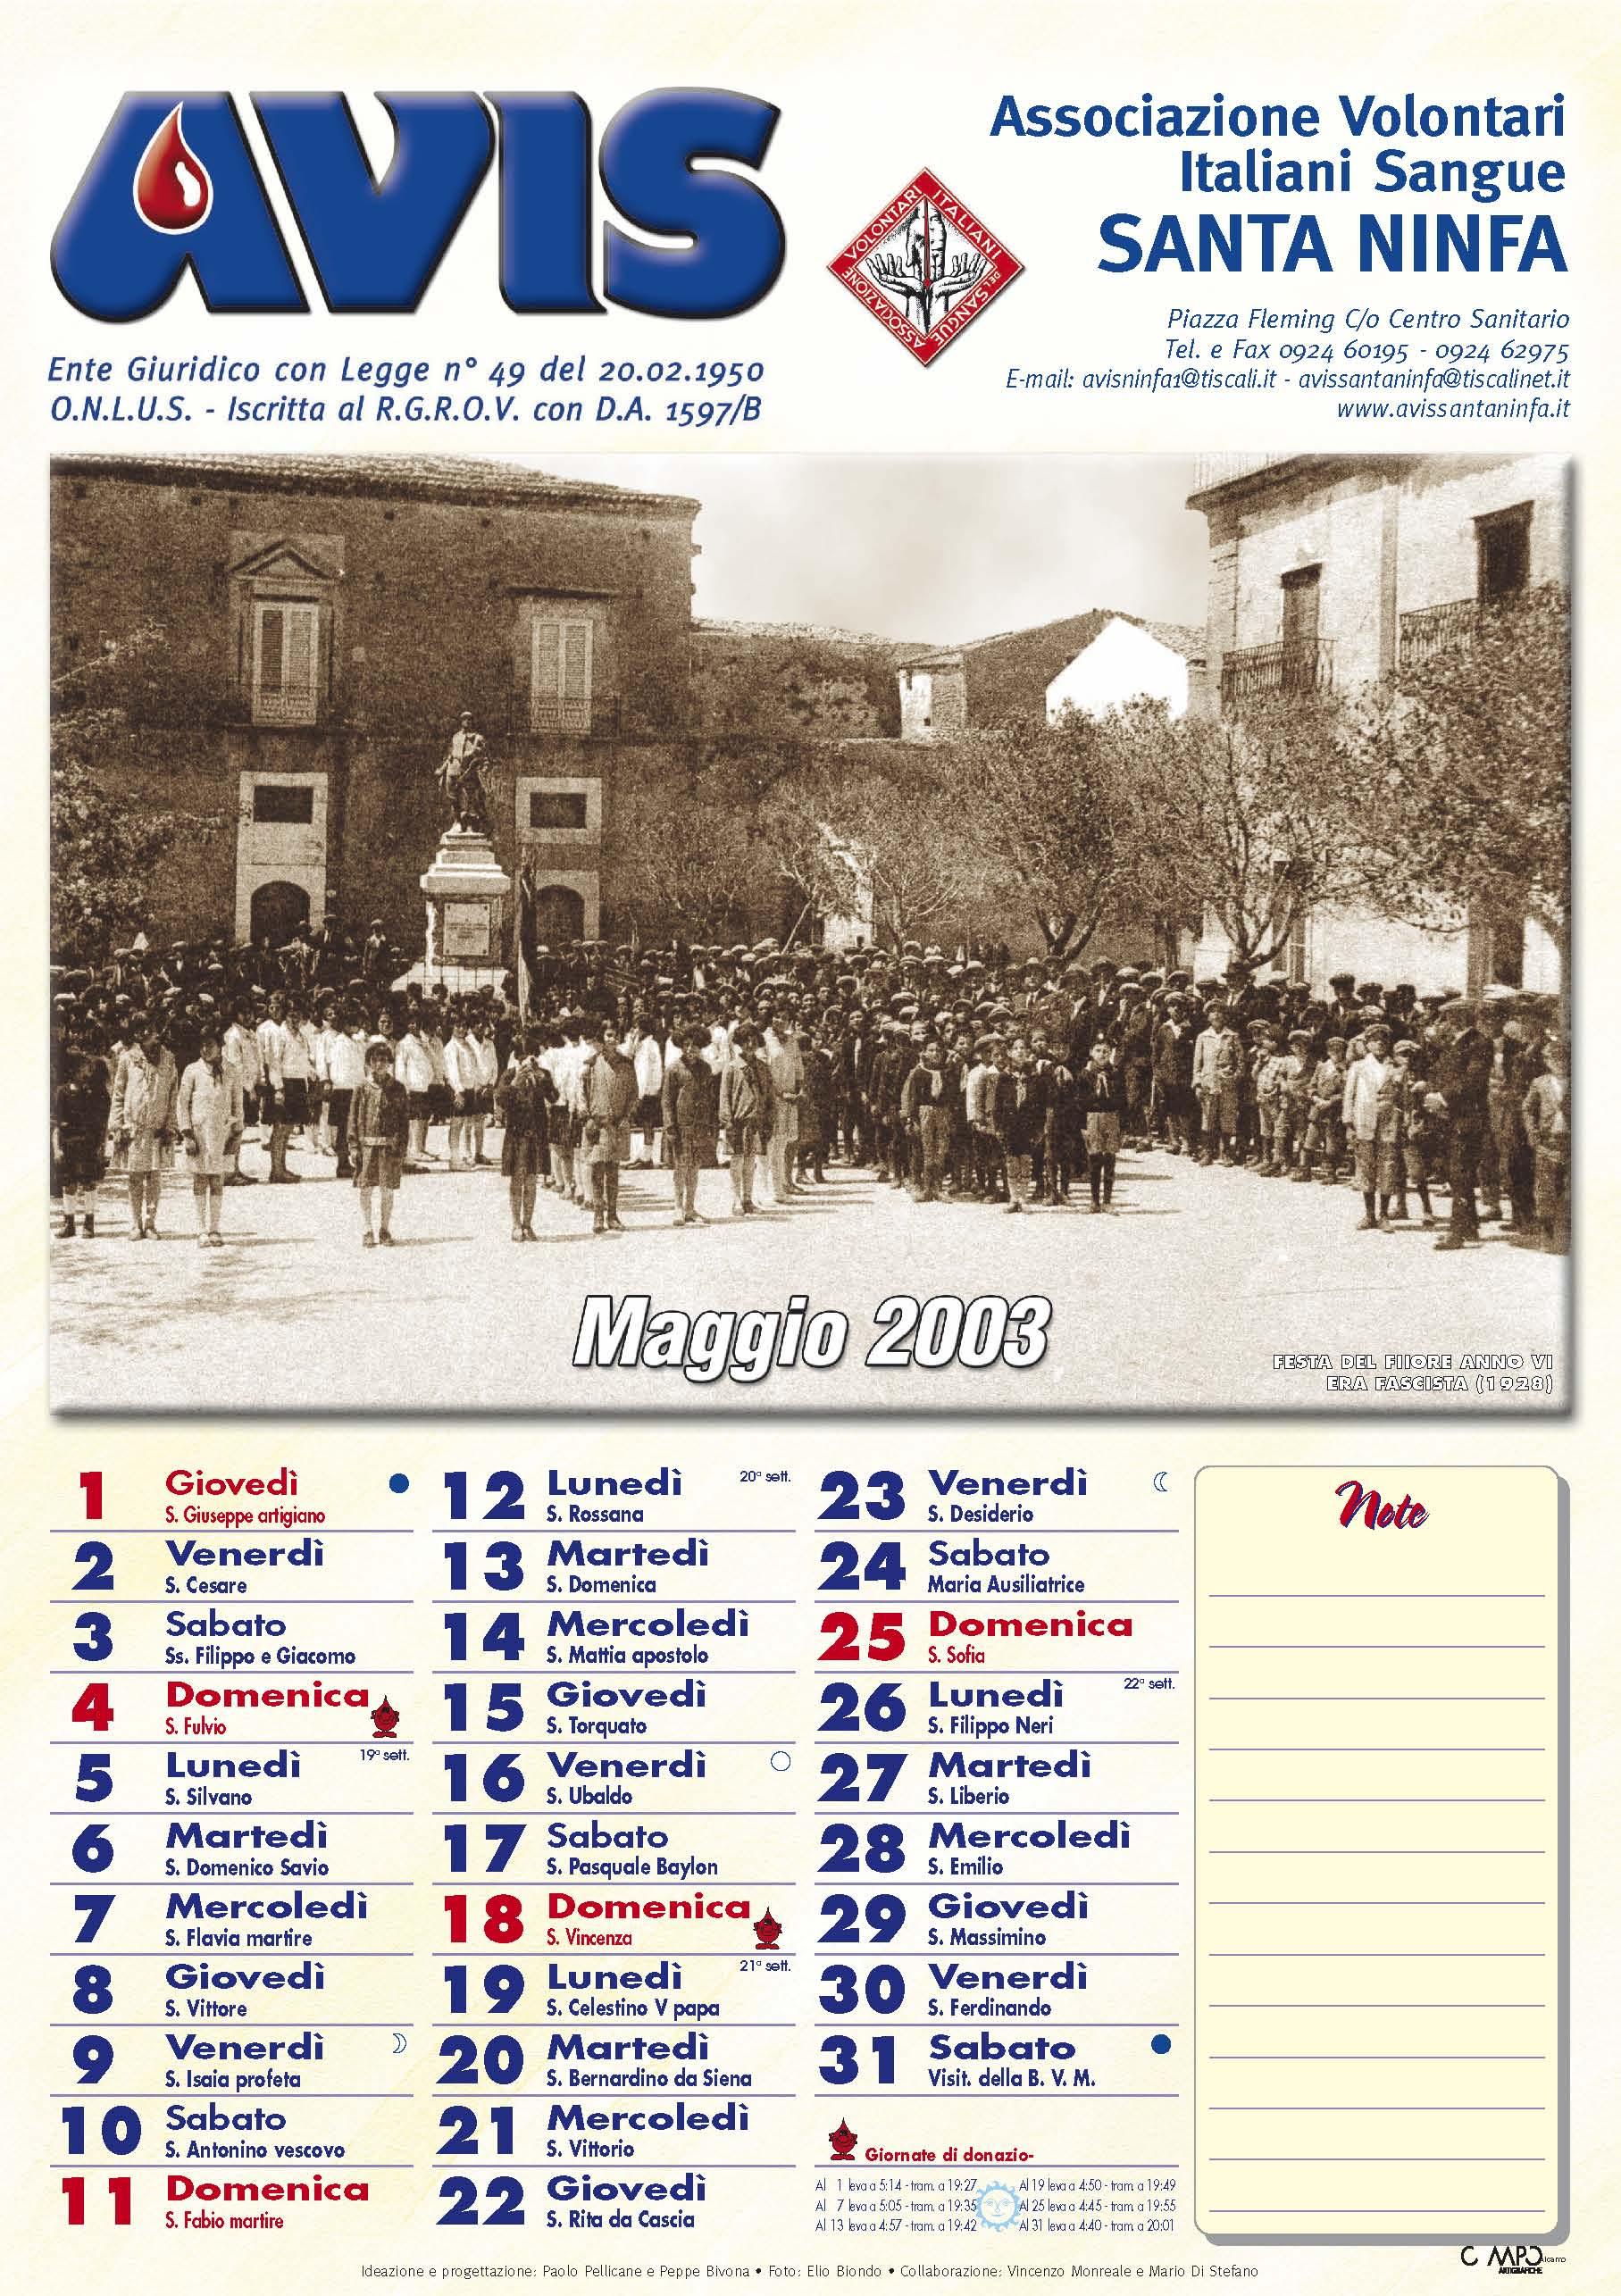 Calendario Avis.Calendario Avis 2003 Avis Santa Ninfa